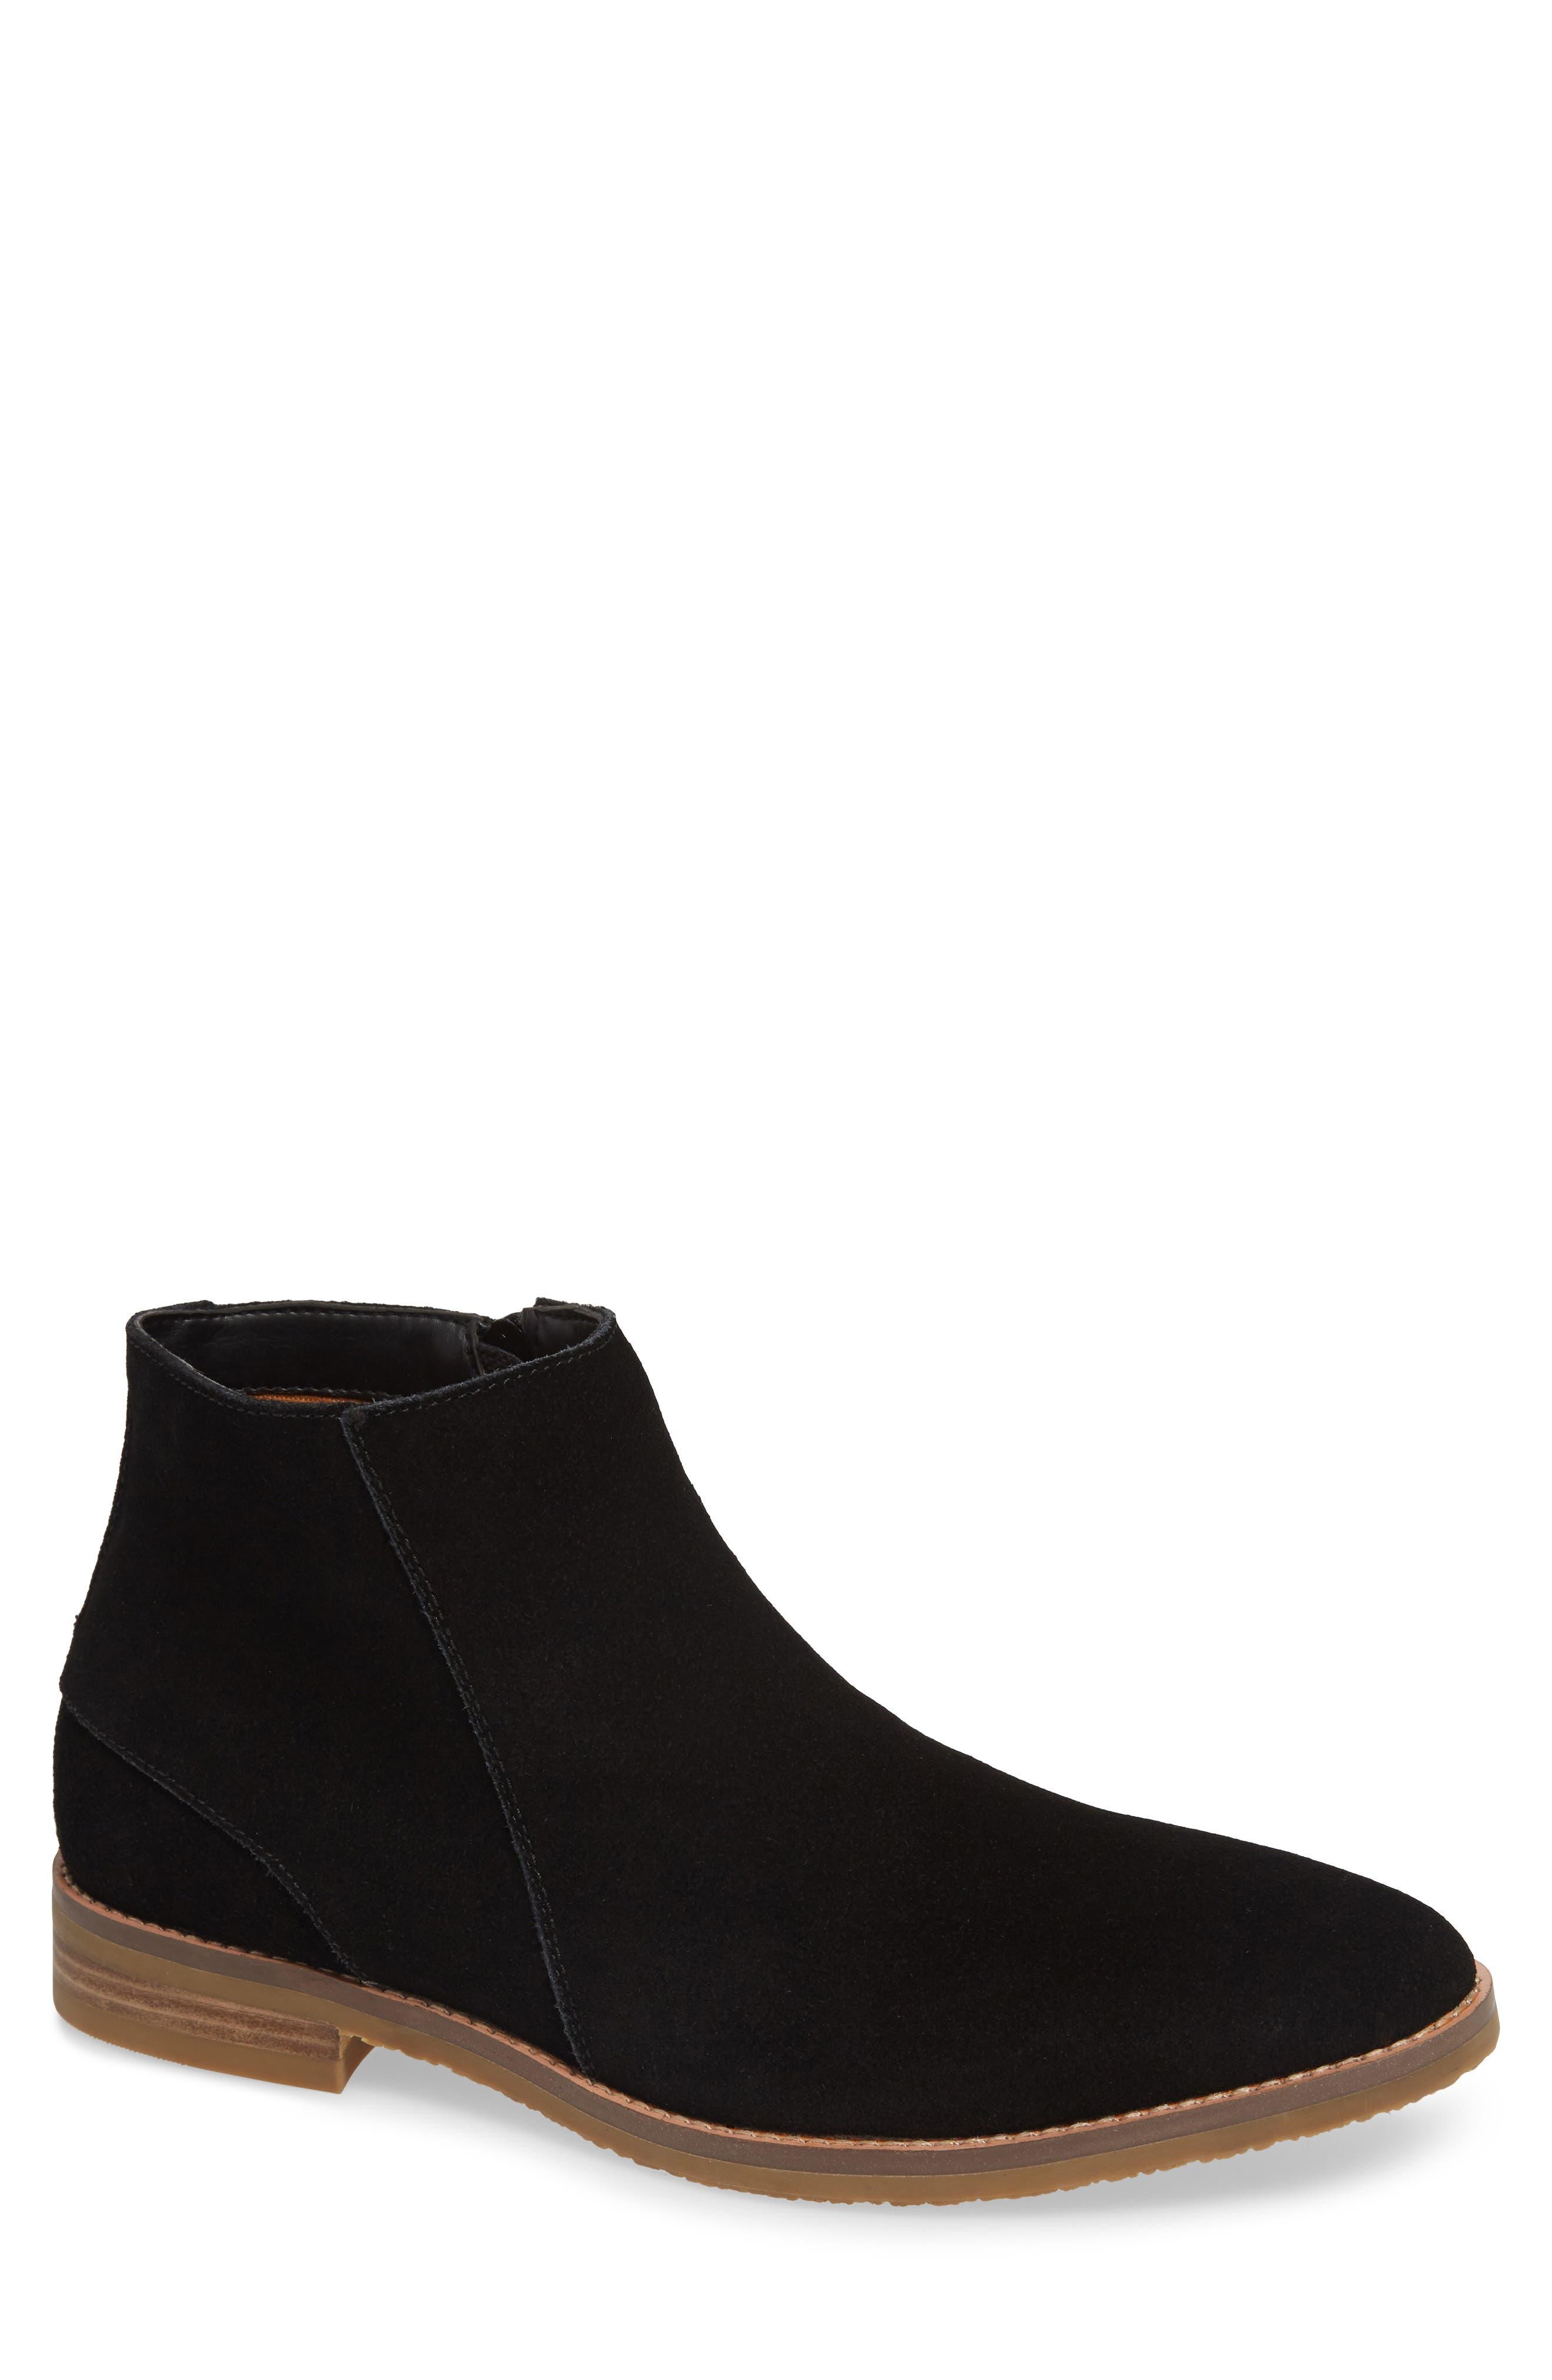 JUMP Brighton Chelsea Zip Boot, Main, color, BLACK